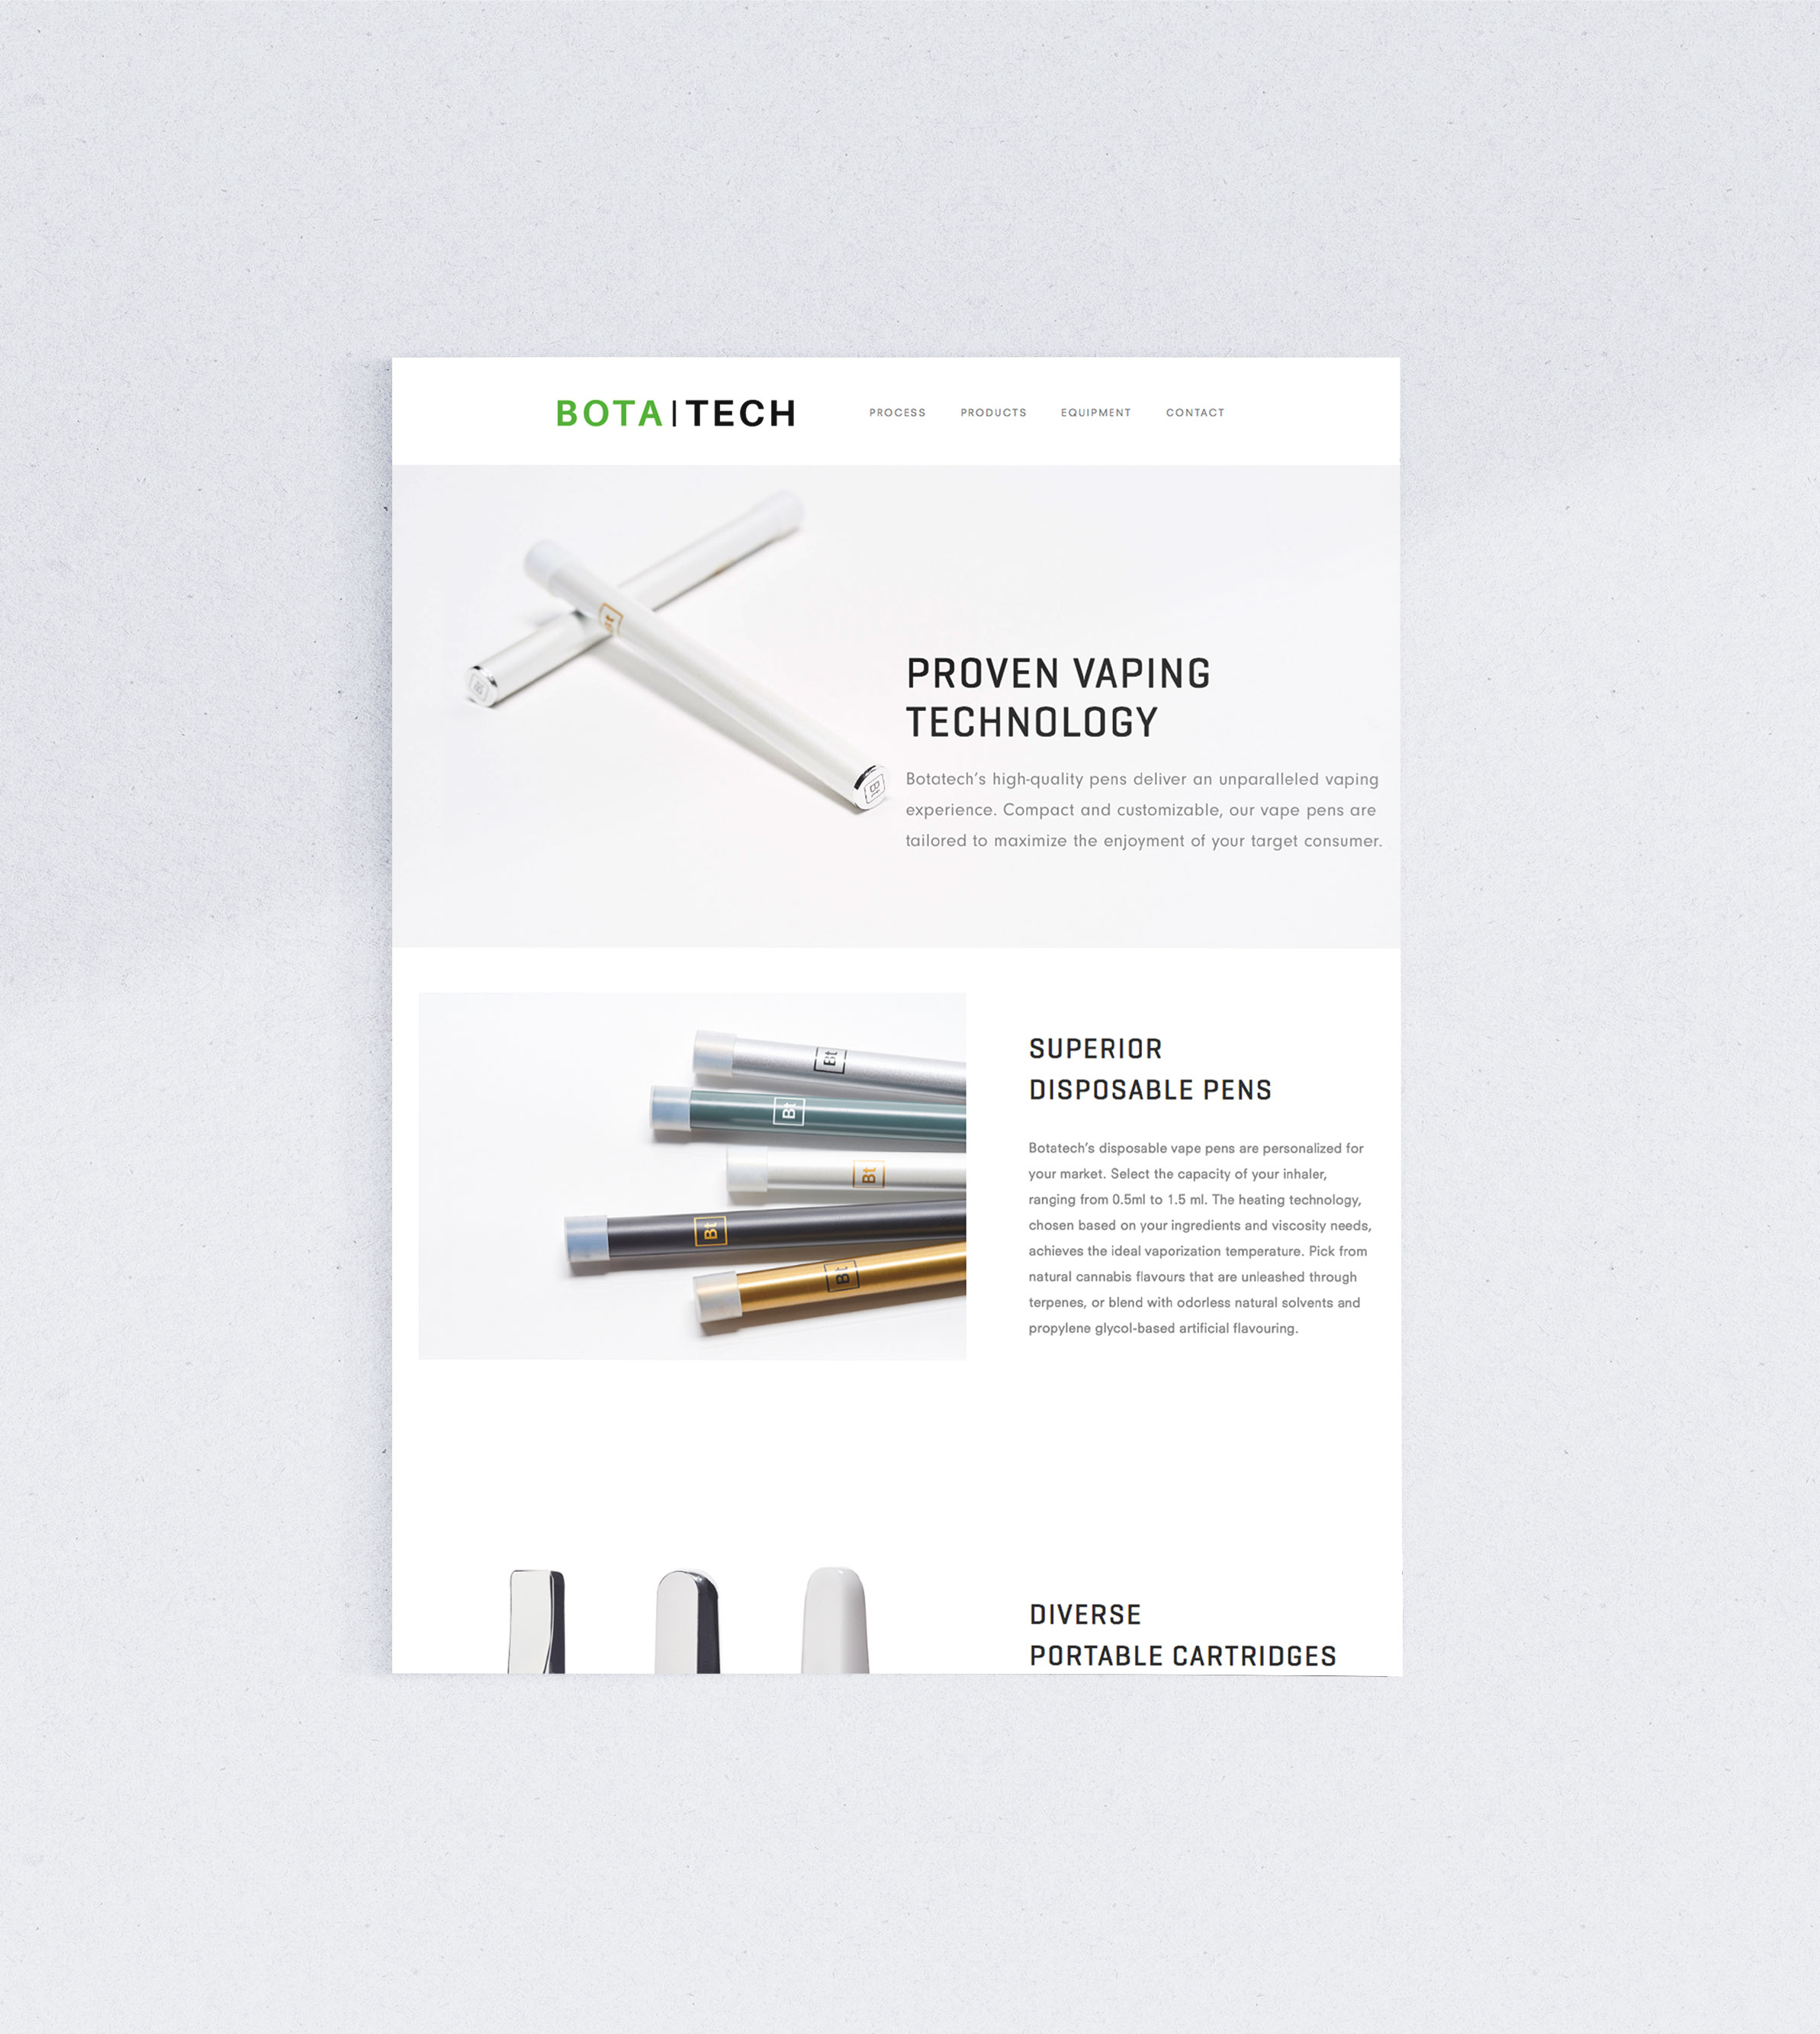 Siblings Creative Design Studio Botatech Products